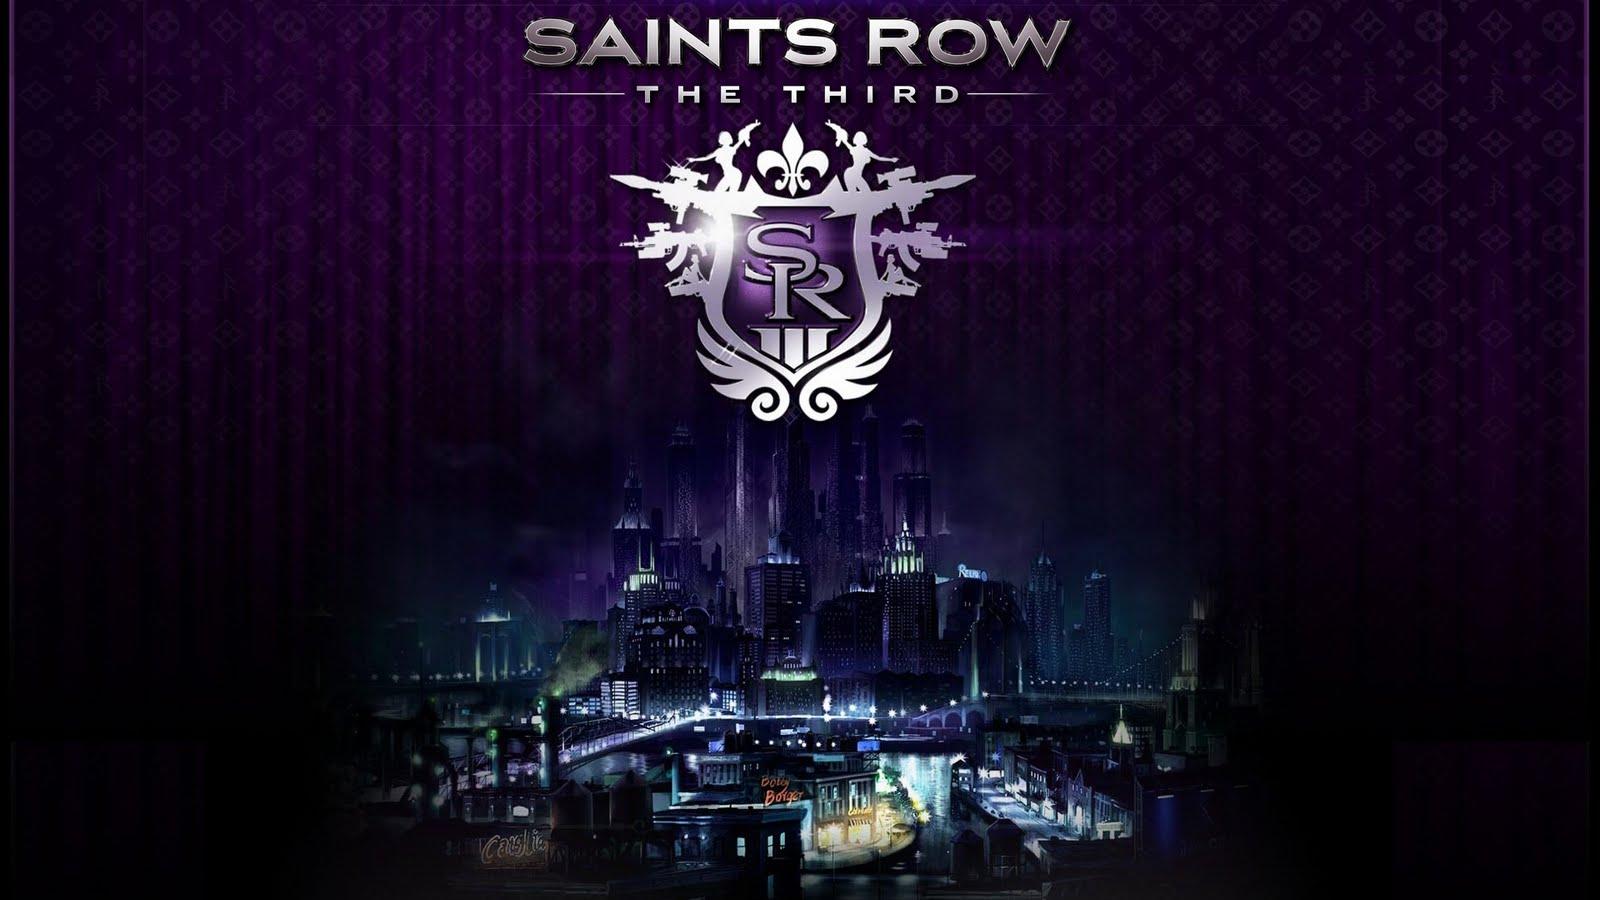 http://3.bp.blogspot.com/-q0VwB3bZU1E/Tg-NdHzZhLI/AAAAAAAAAd4/b-LbHafd_zk/s1600/saints_row_2.jpg